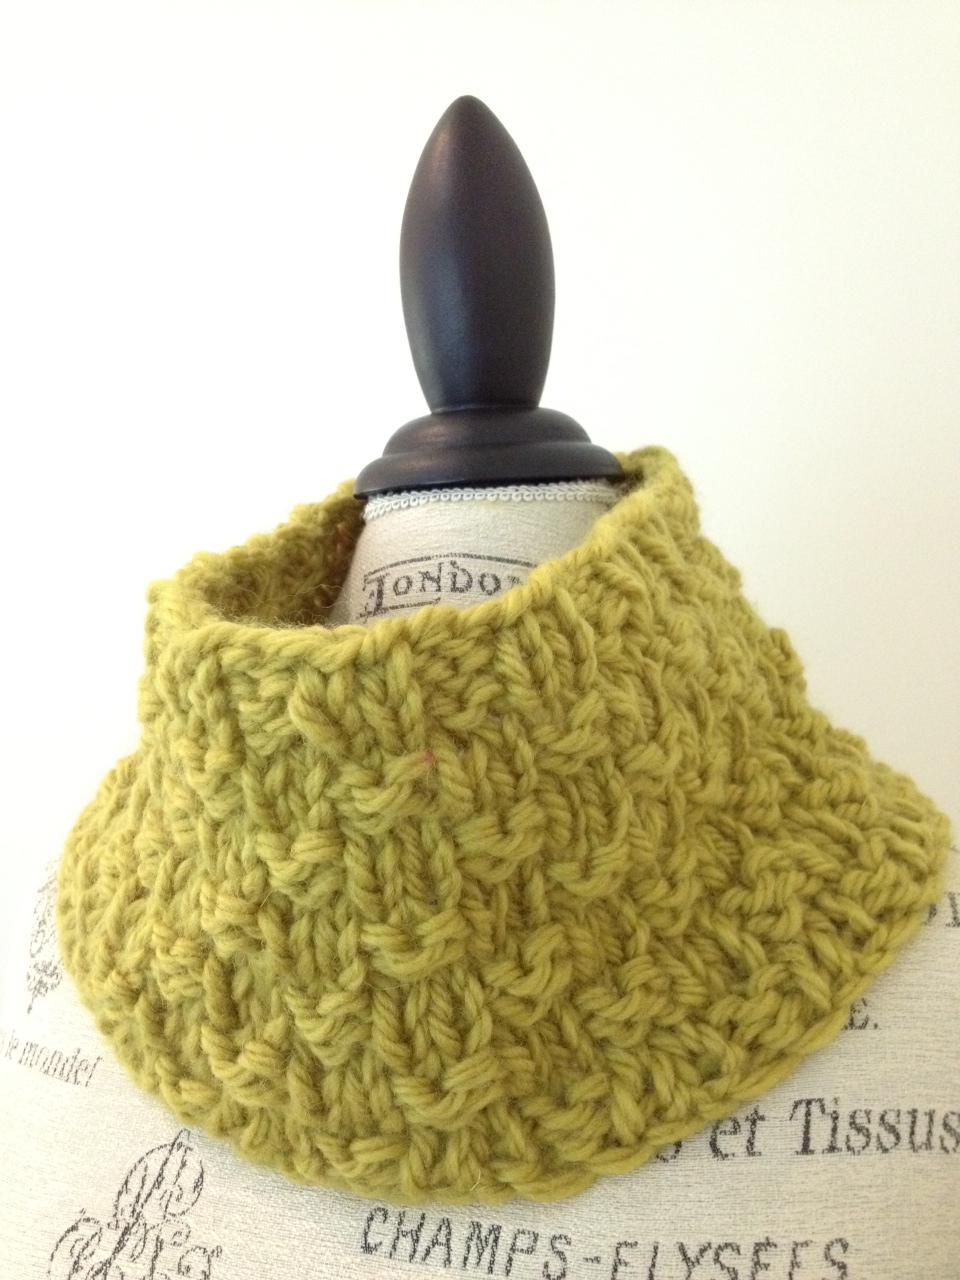 Cobblestone Street Cowl Free Knitting Pattern — Blog.NobleKnits